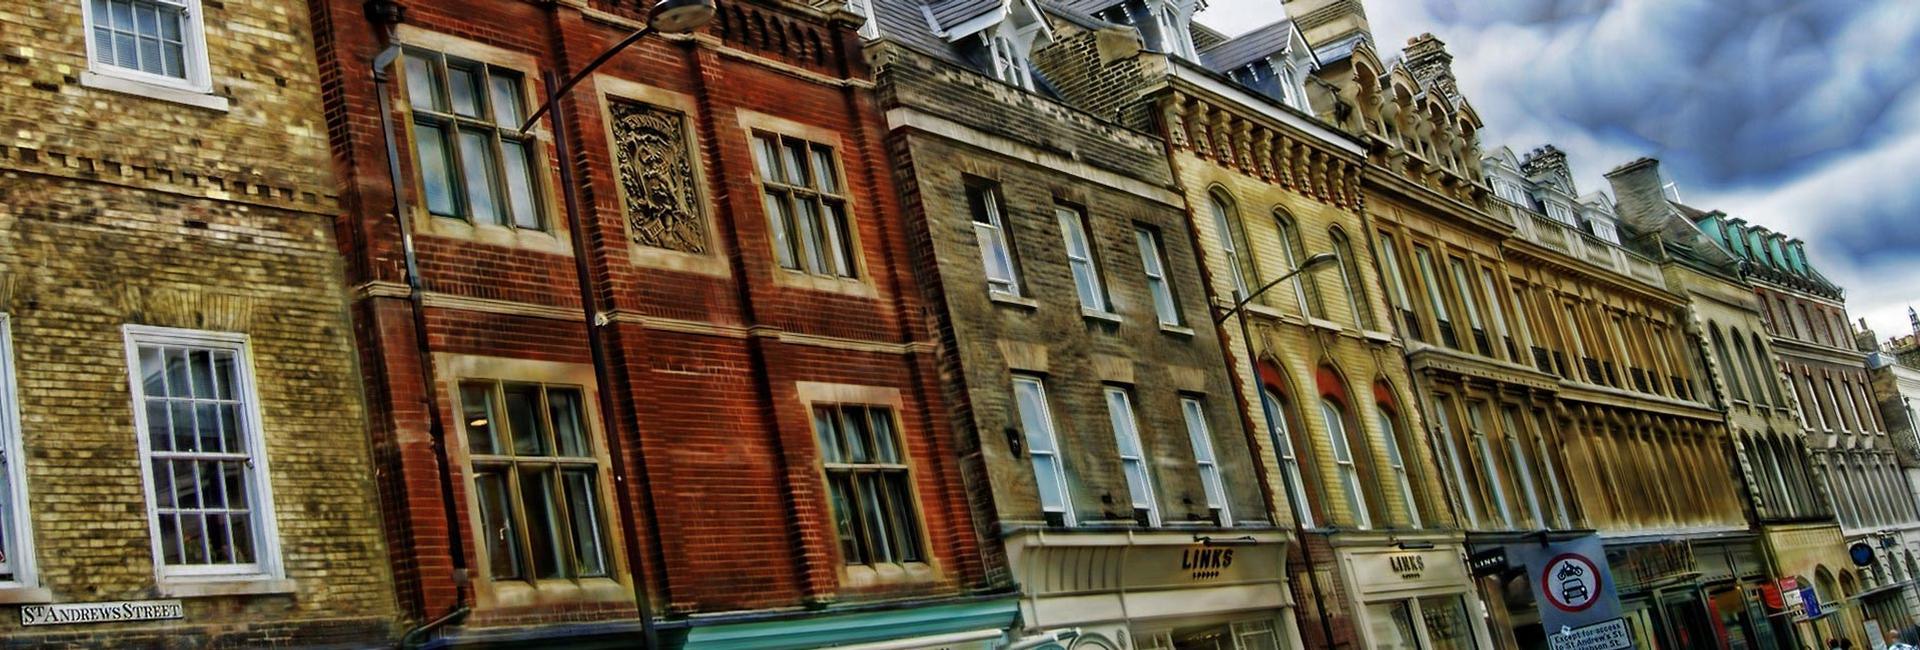 UKProperty market review November 2015 - Property Activity Index